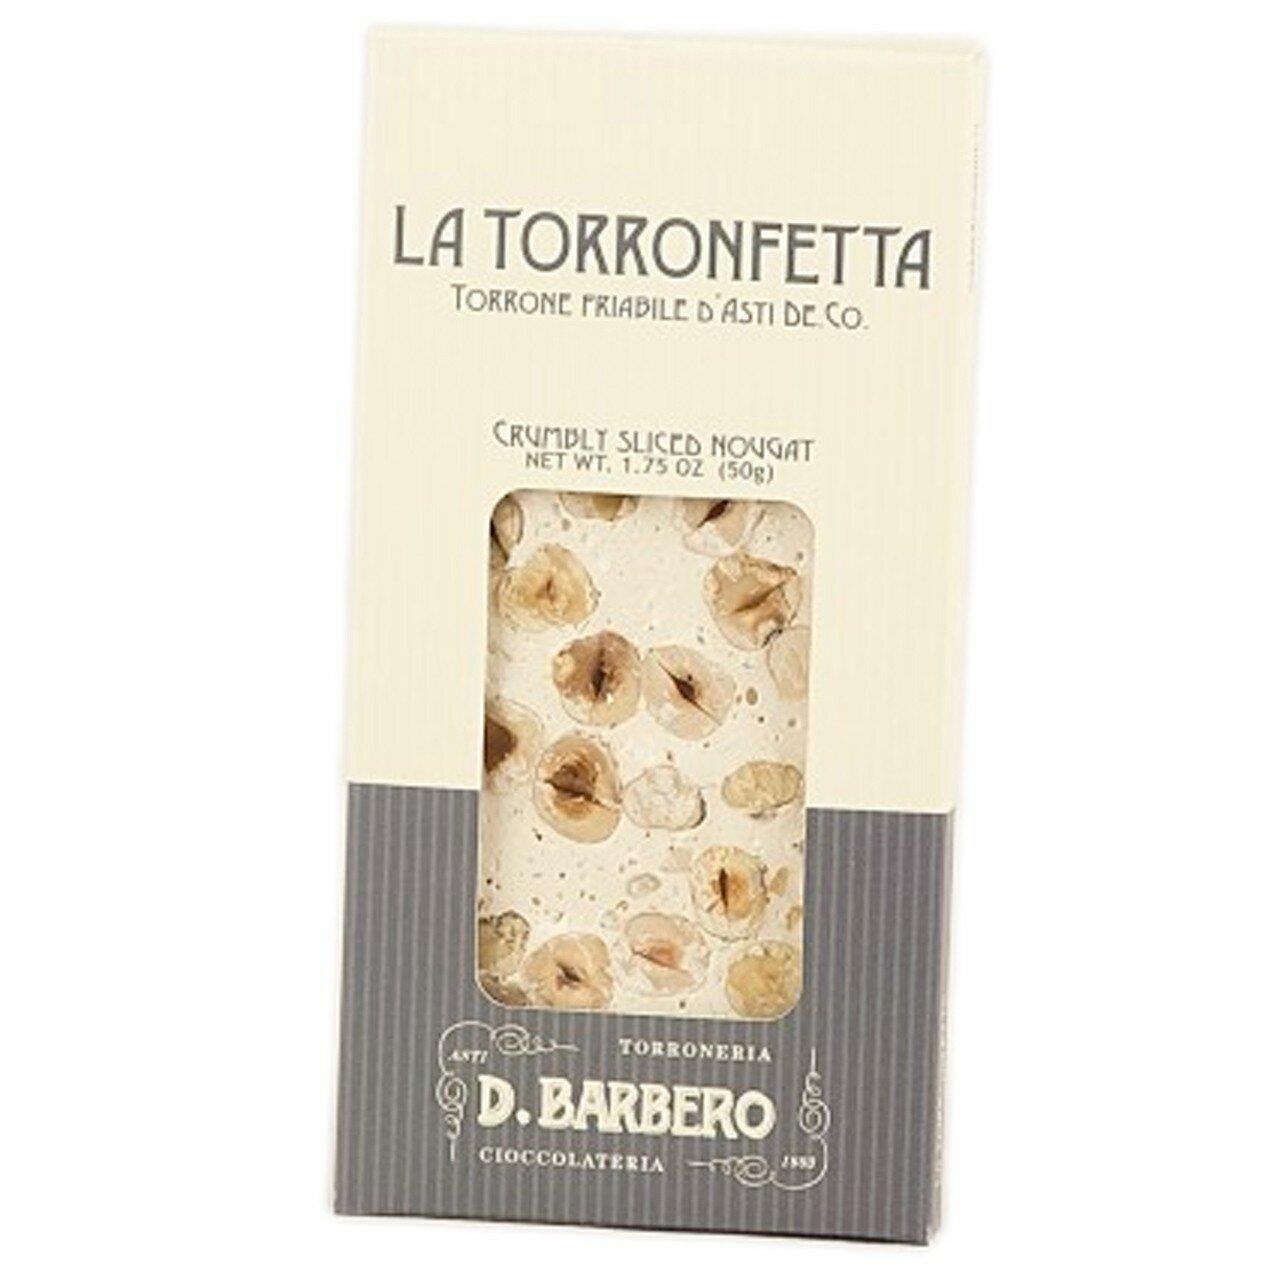 La Torronfetta singola in astuccio gr. 50